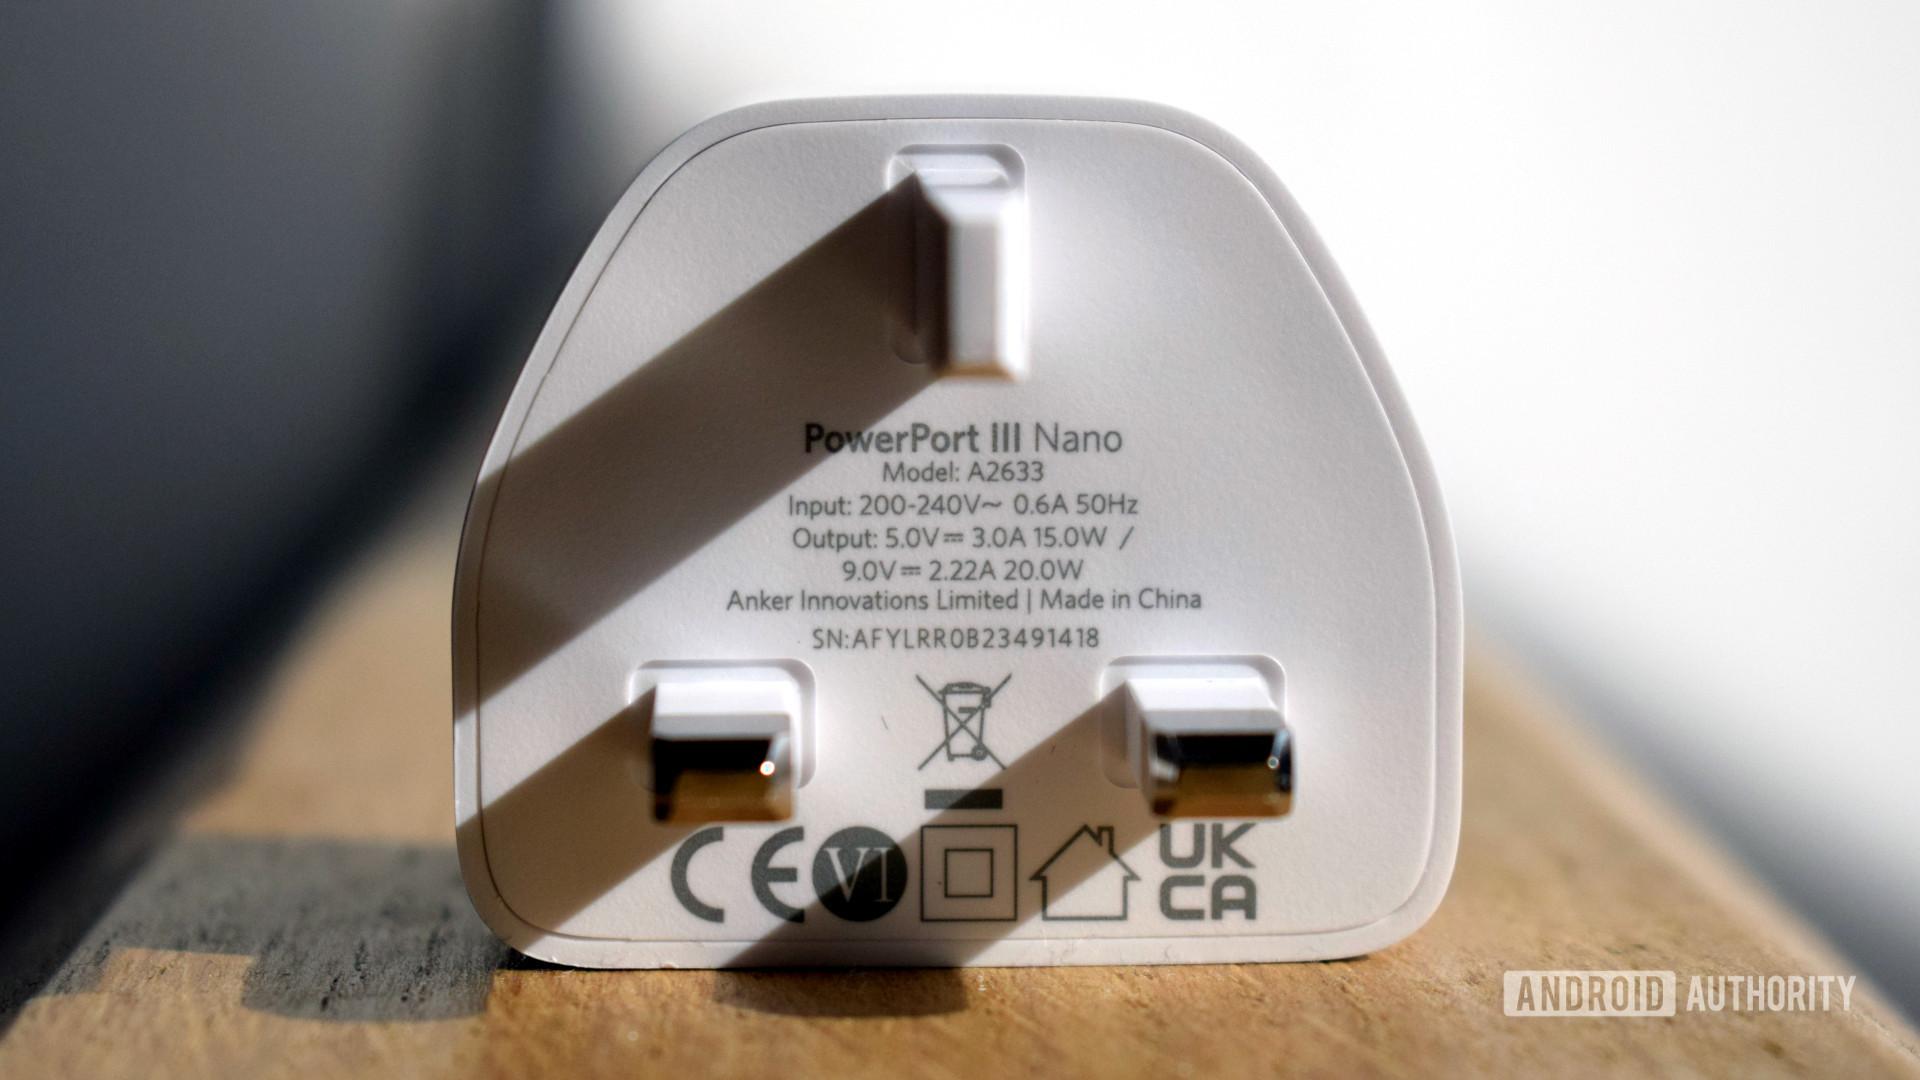 Anker PowerPort III Nano plug specs